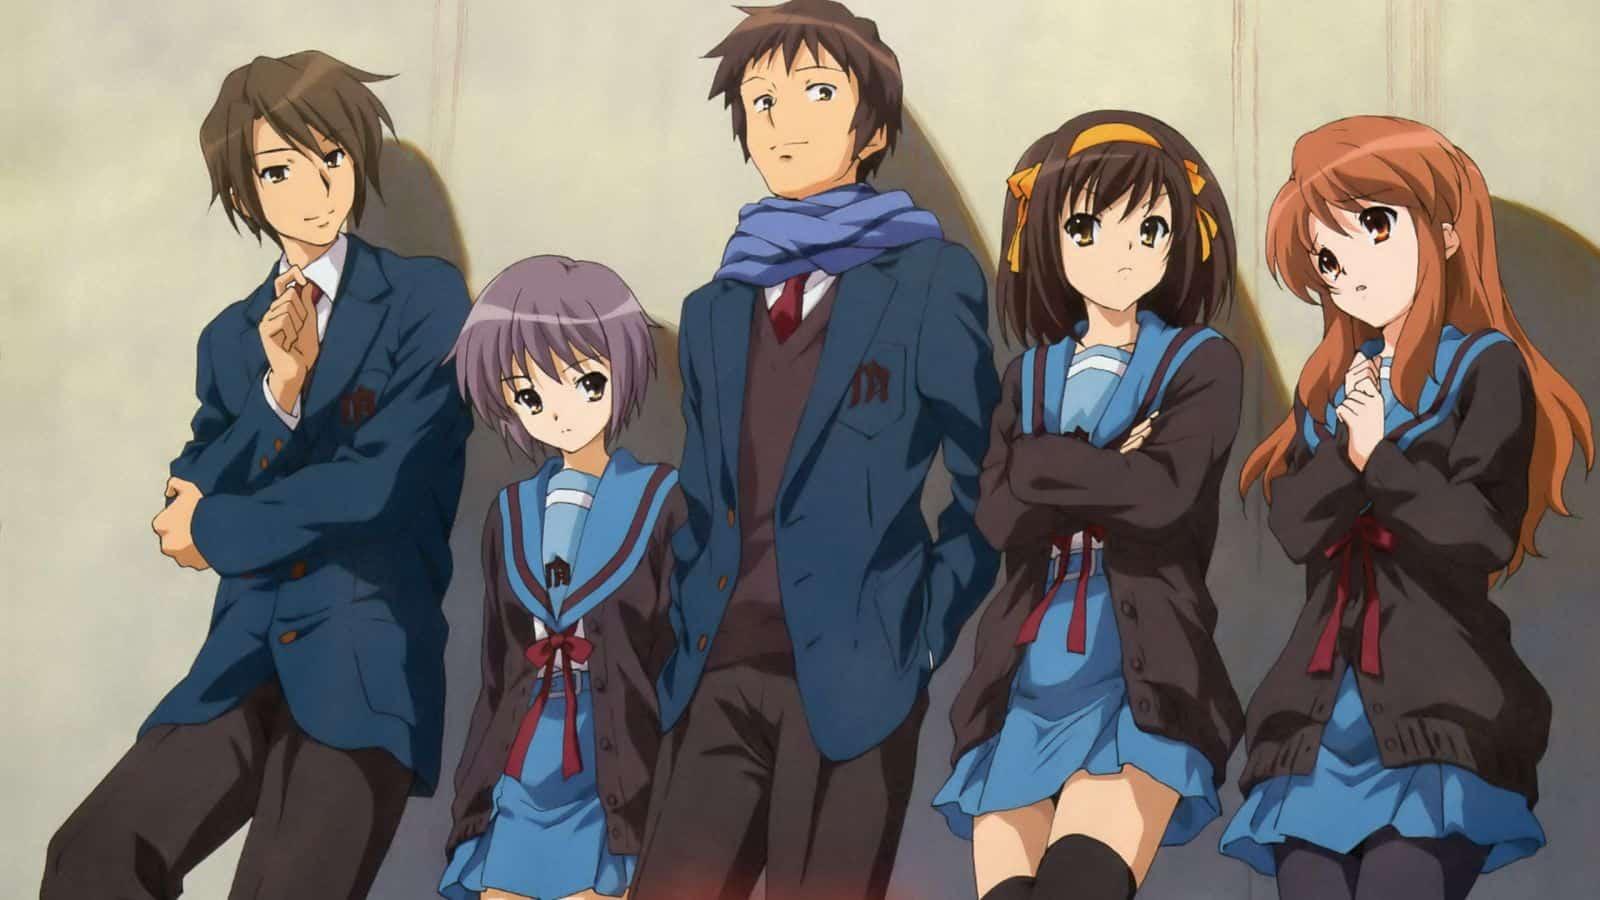 Top 10 Light Novel Anime That Need a Sequel